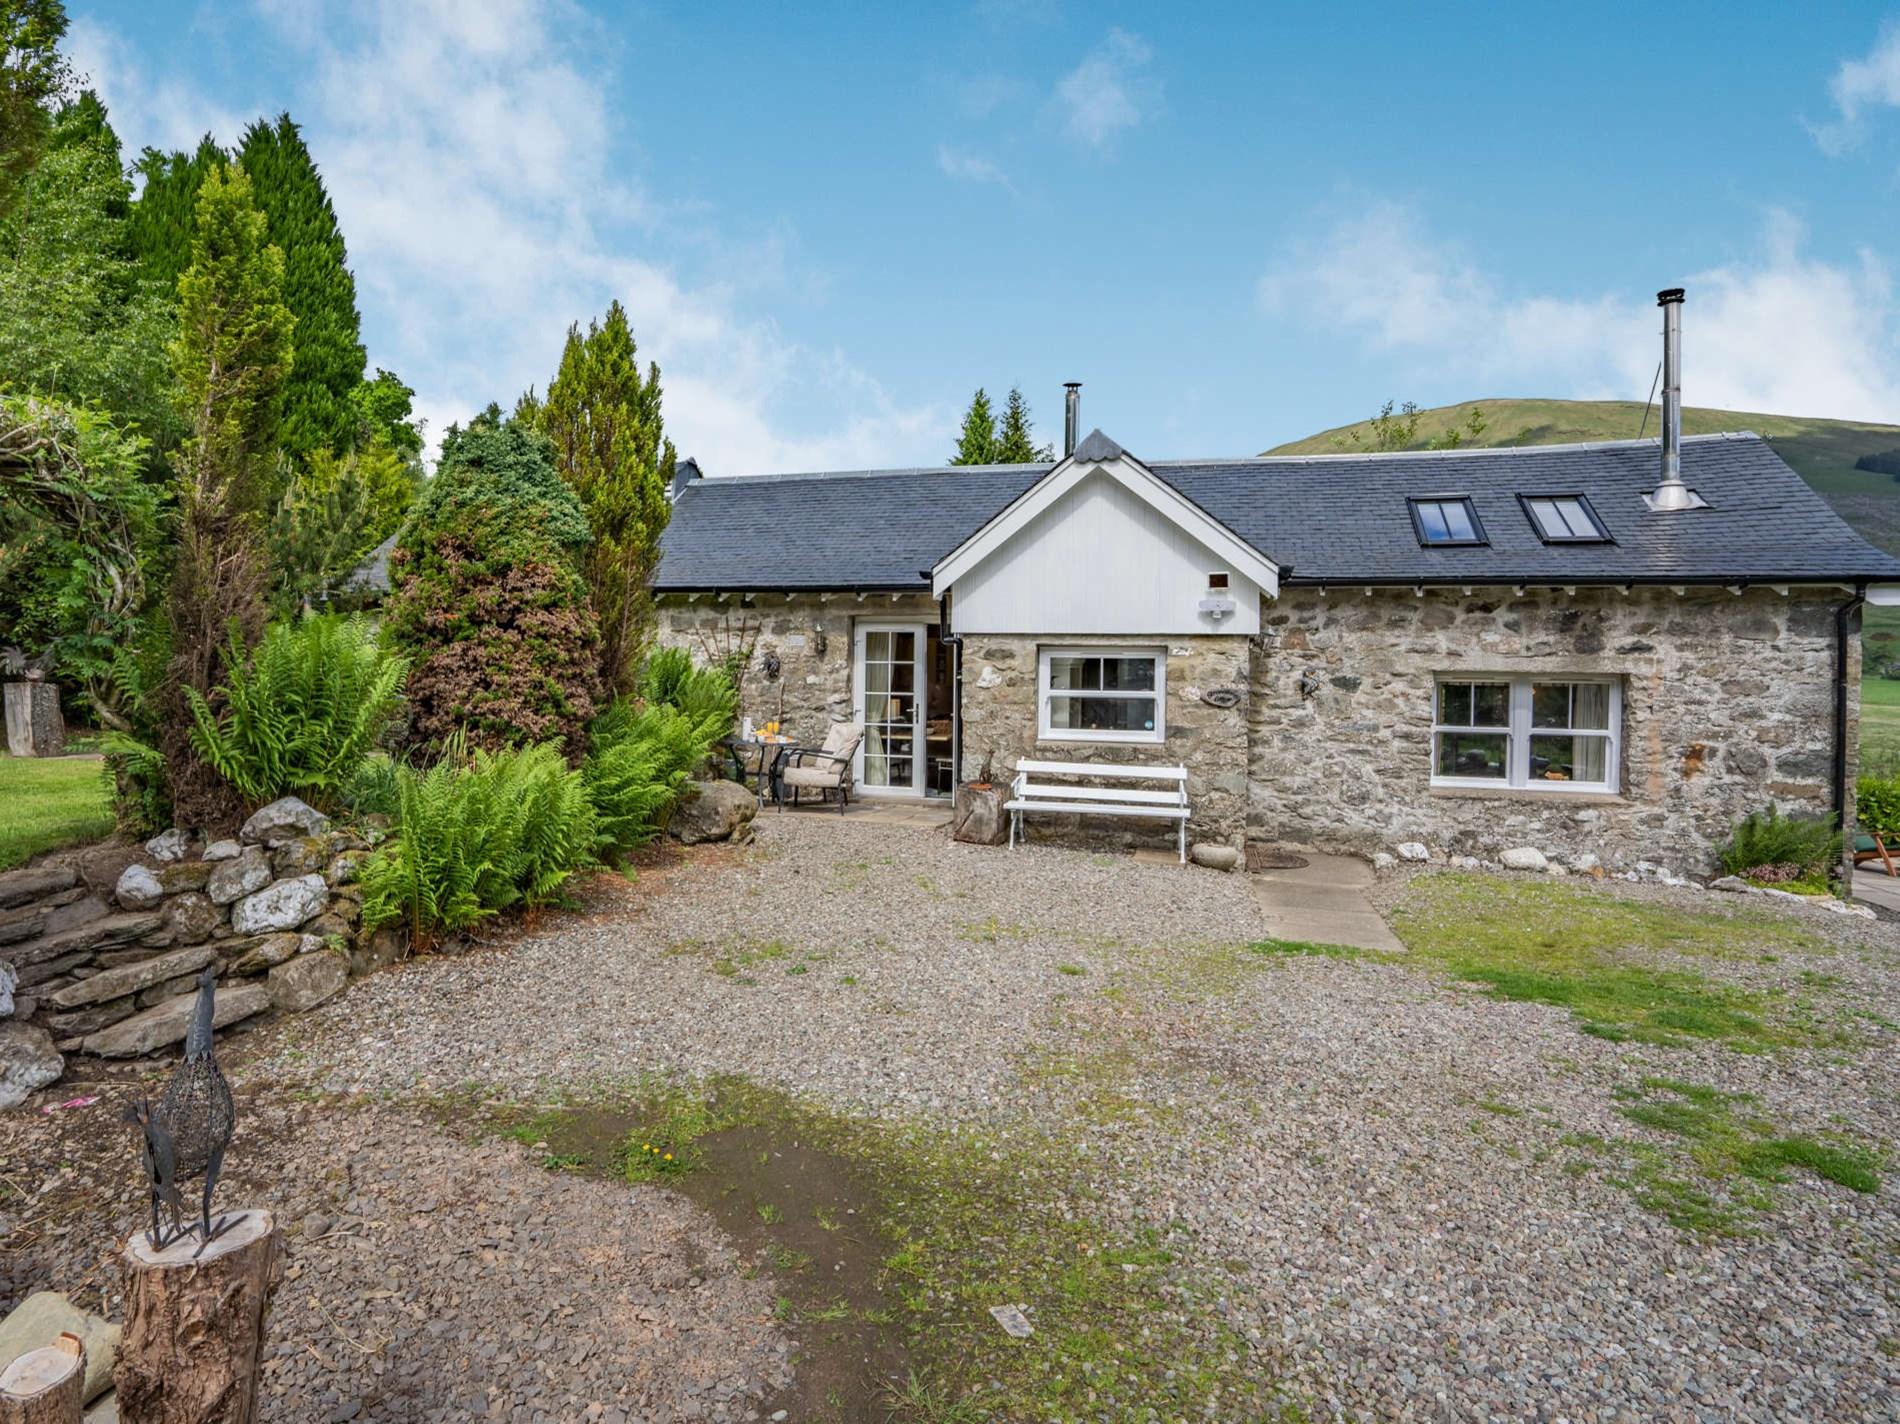 1 Bedroom Cottage in Callander, Callander, Scottish Borders